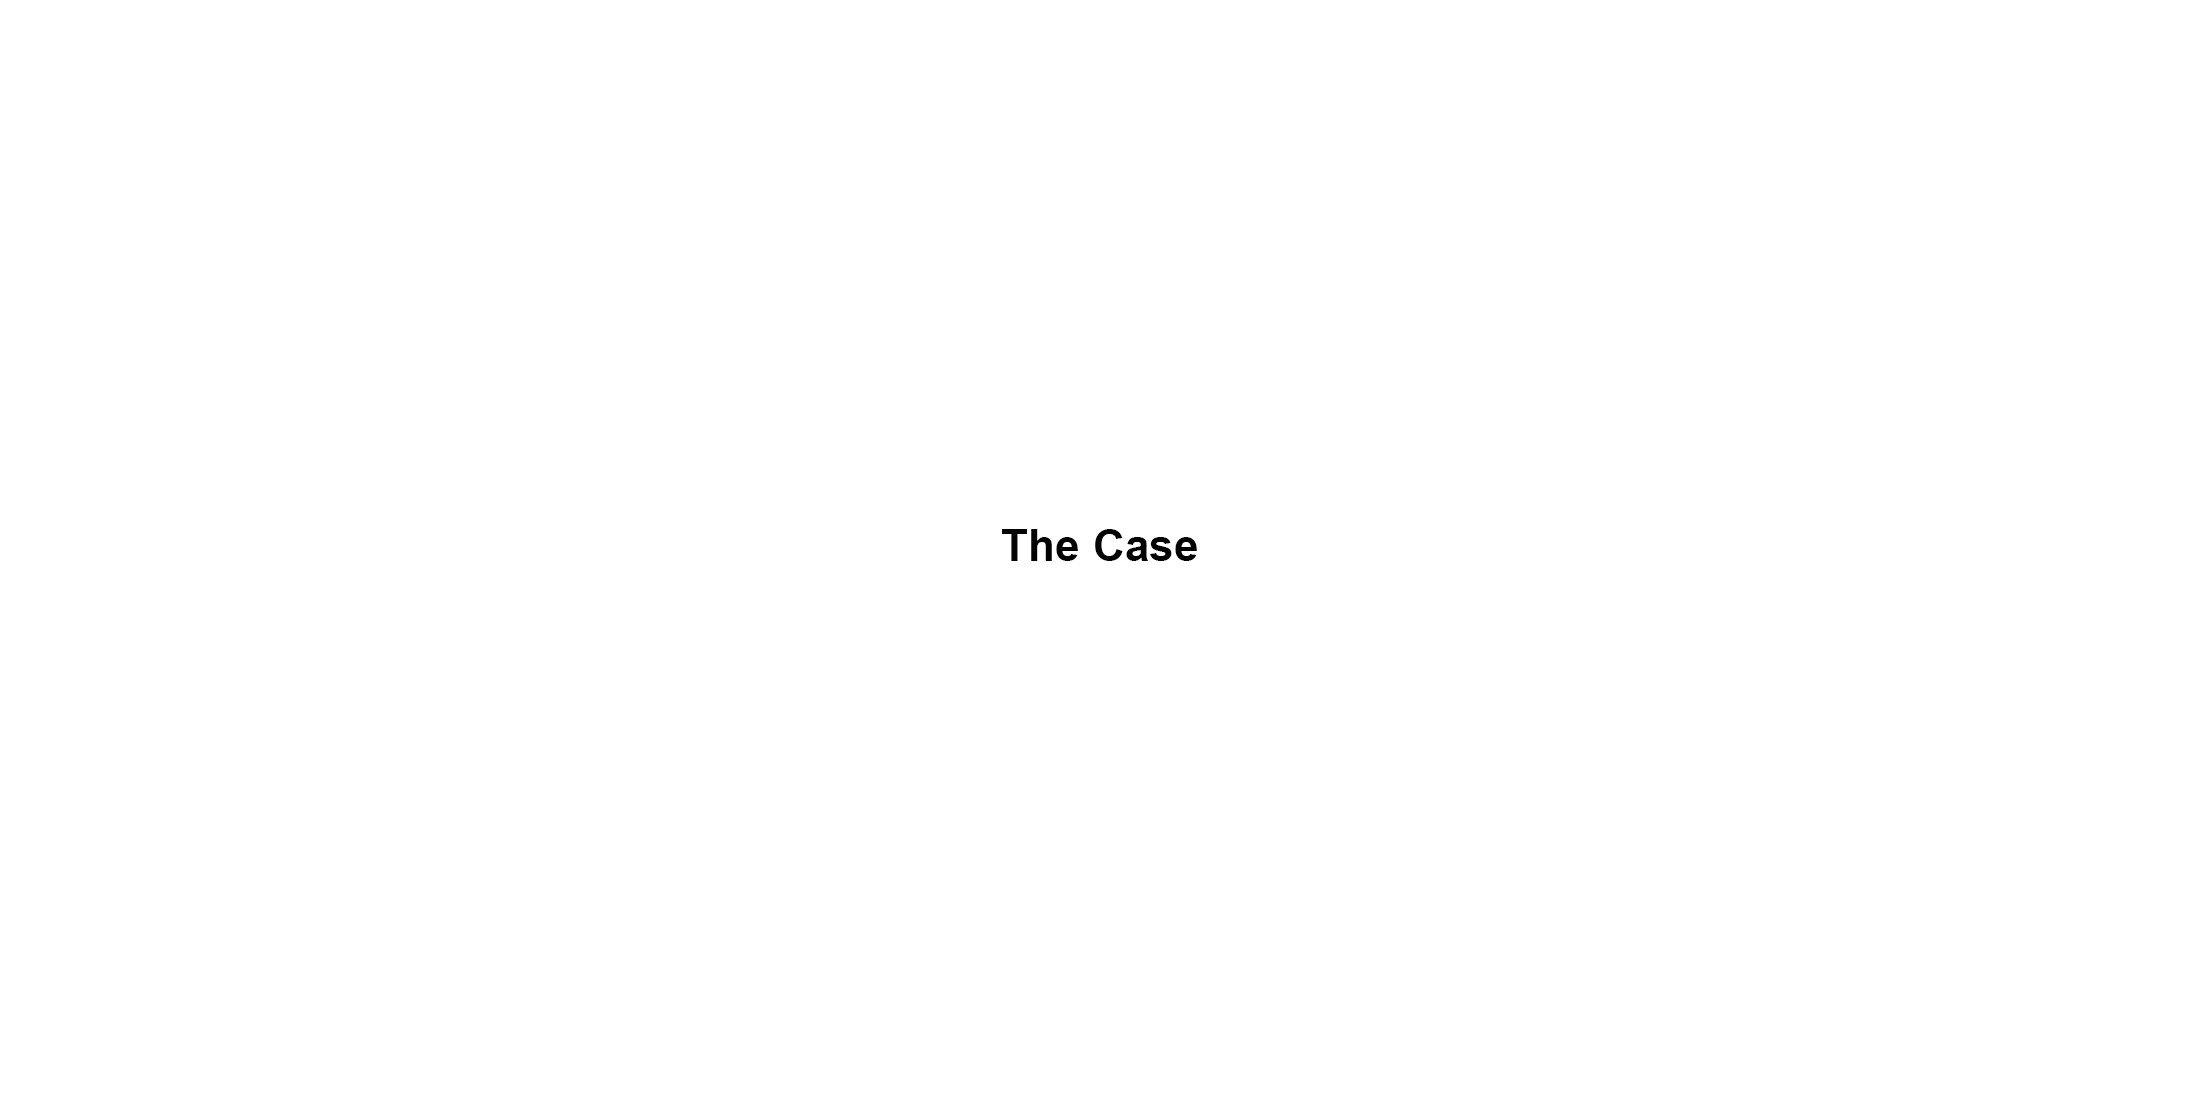 The Case.jpg